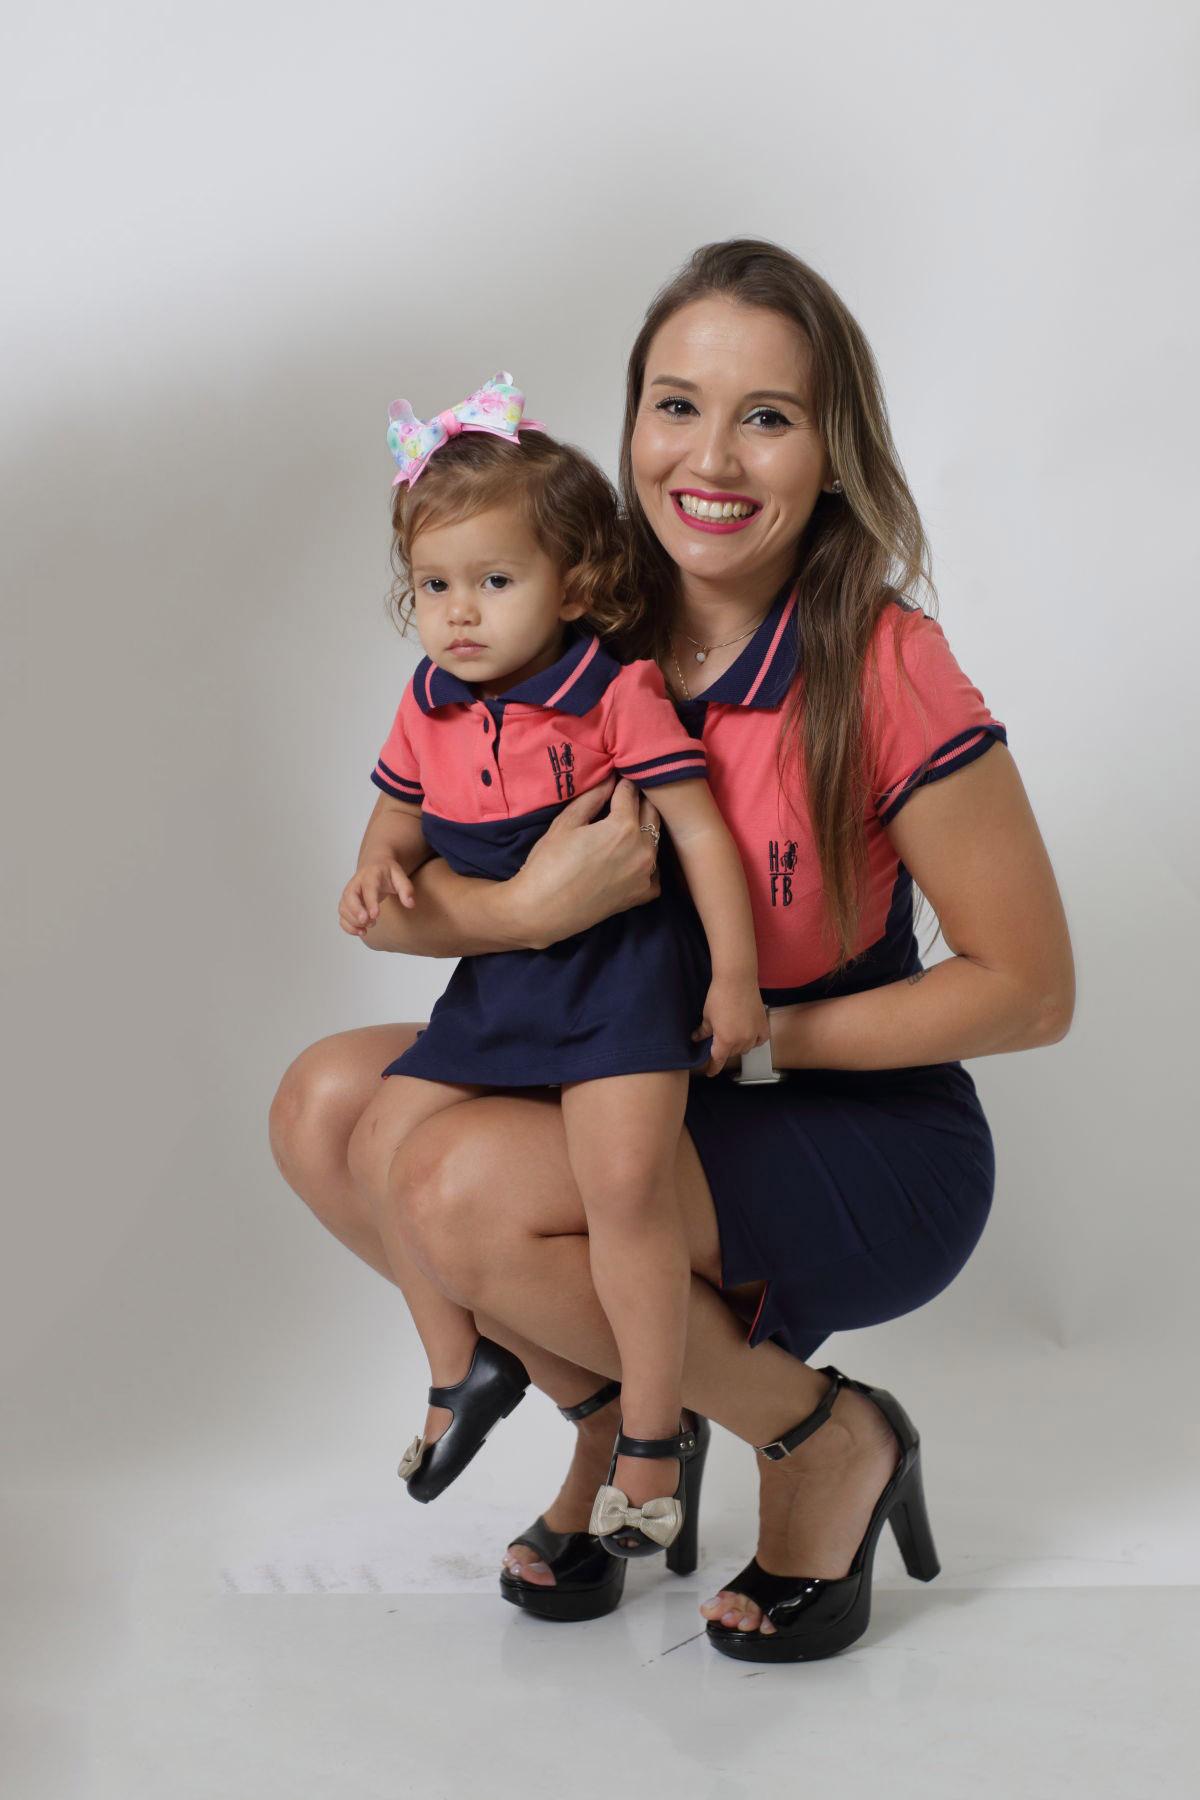 MÃE E FILHA > Kit 02 Vestidos Adulto e Infantil Goiaba com Marinho PREMIUM